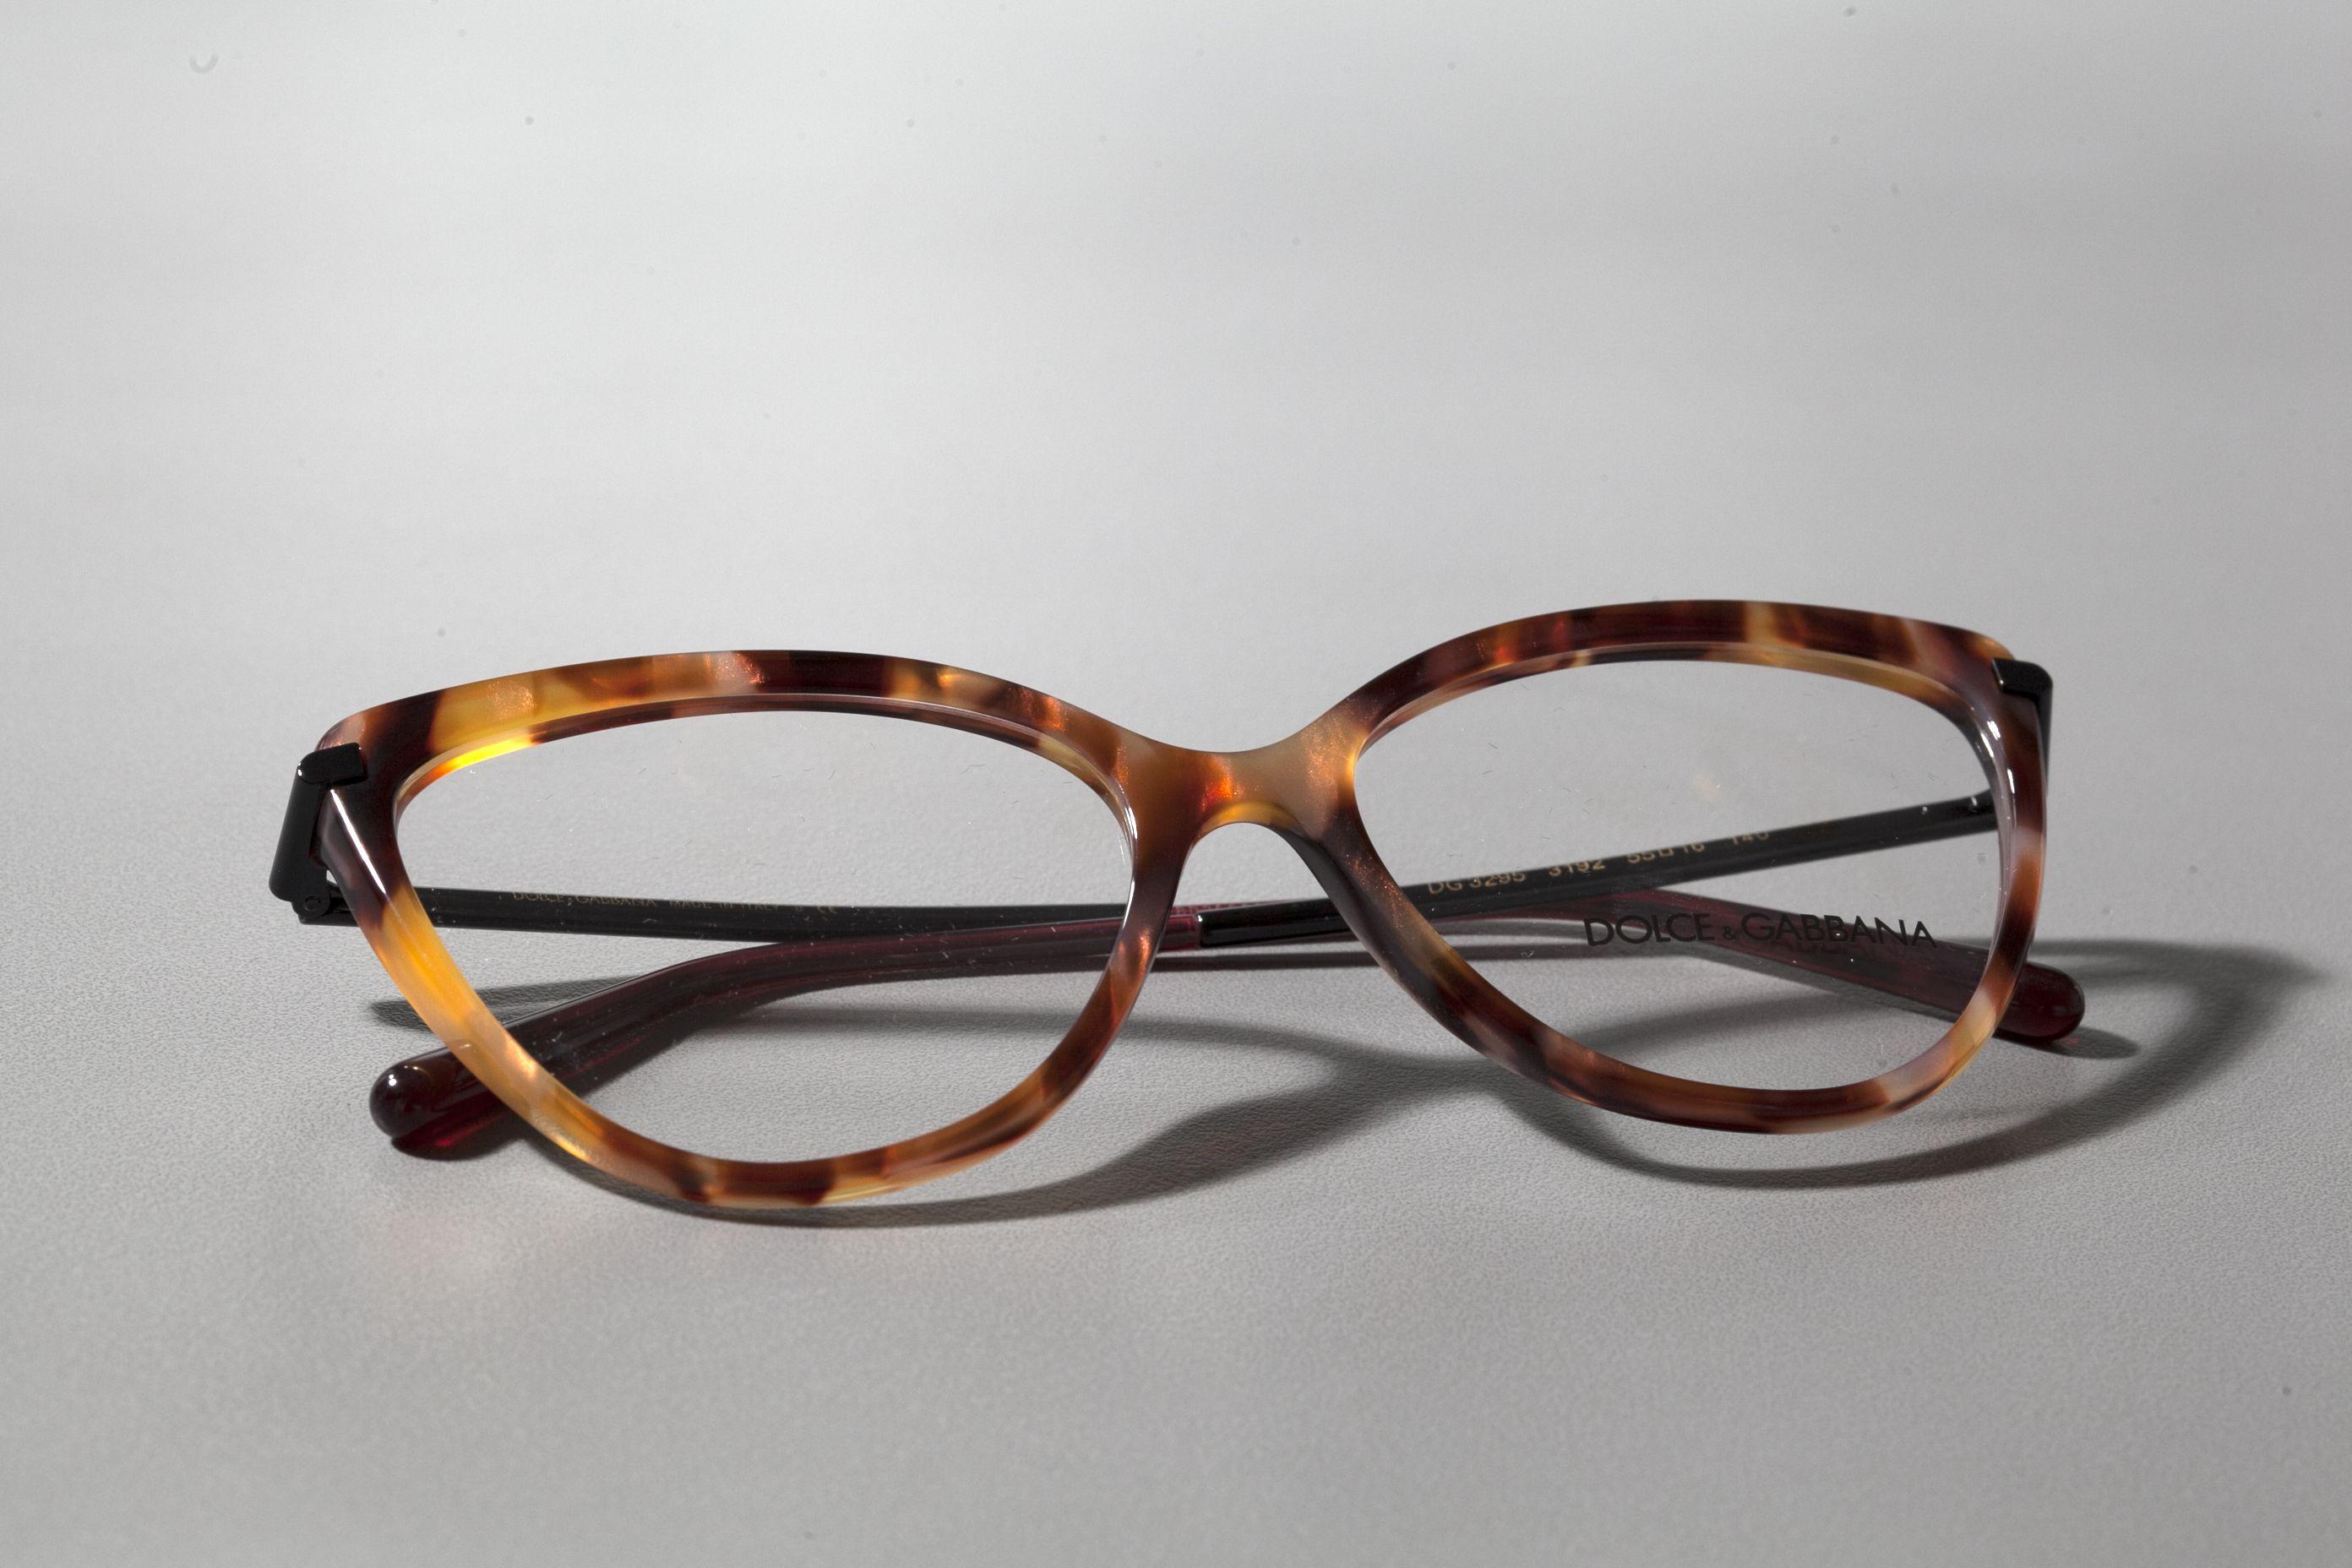 c0d9b85694f DOLCE   GABBANA DG 3295 - ÓCULOS DE GRAU  dolce gabbana  eyewear   oculosfeminino